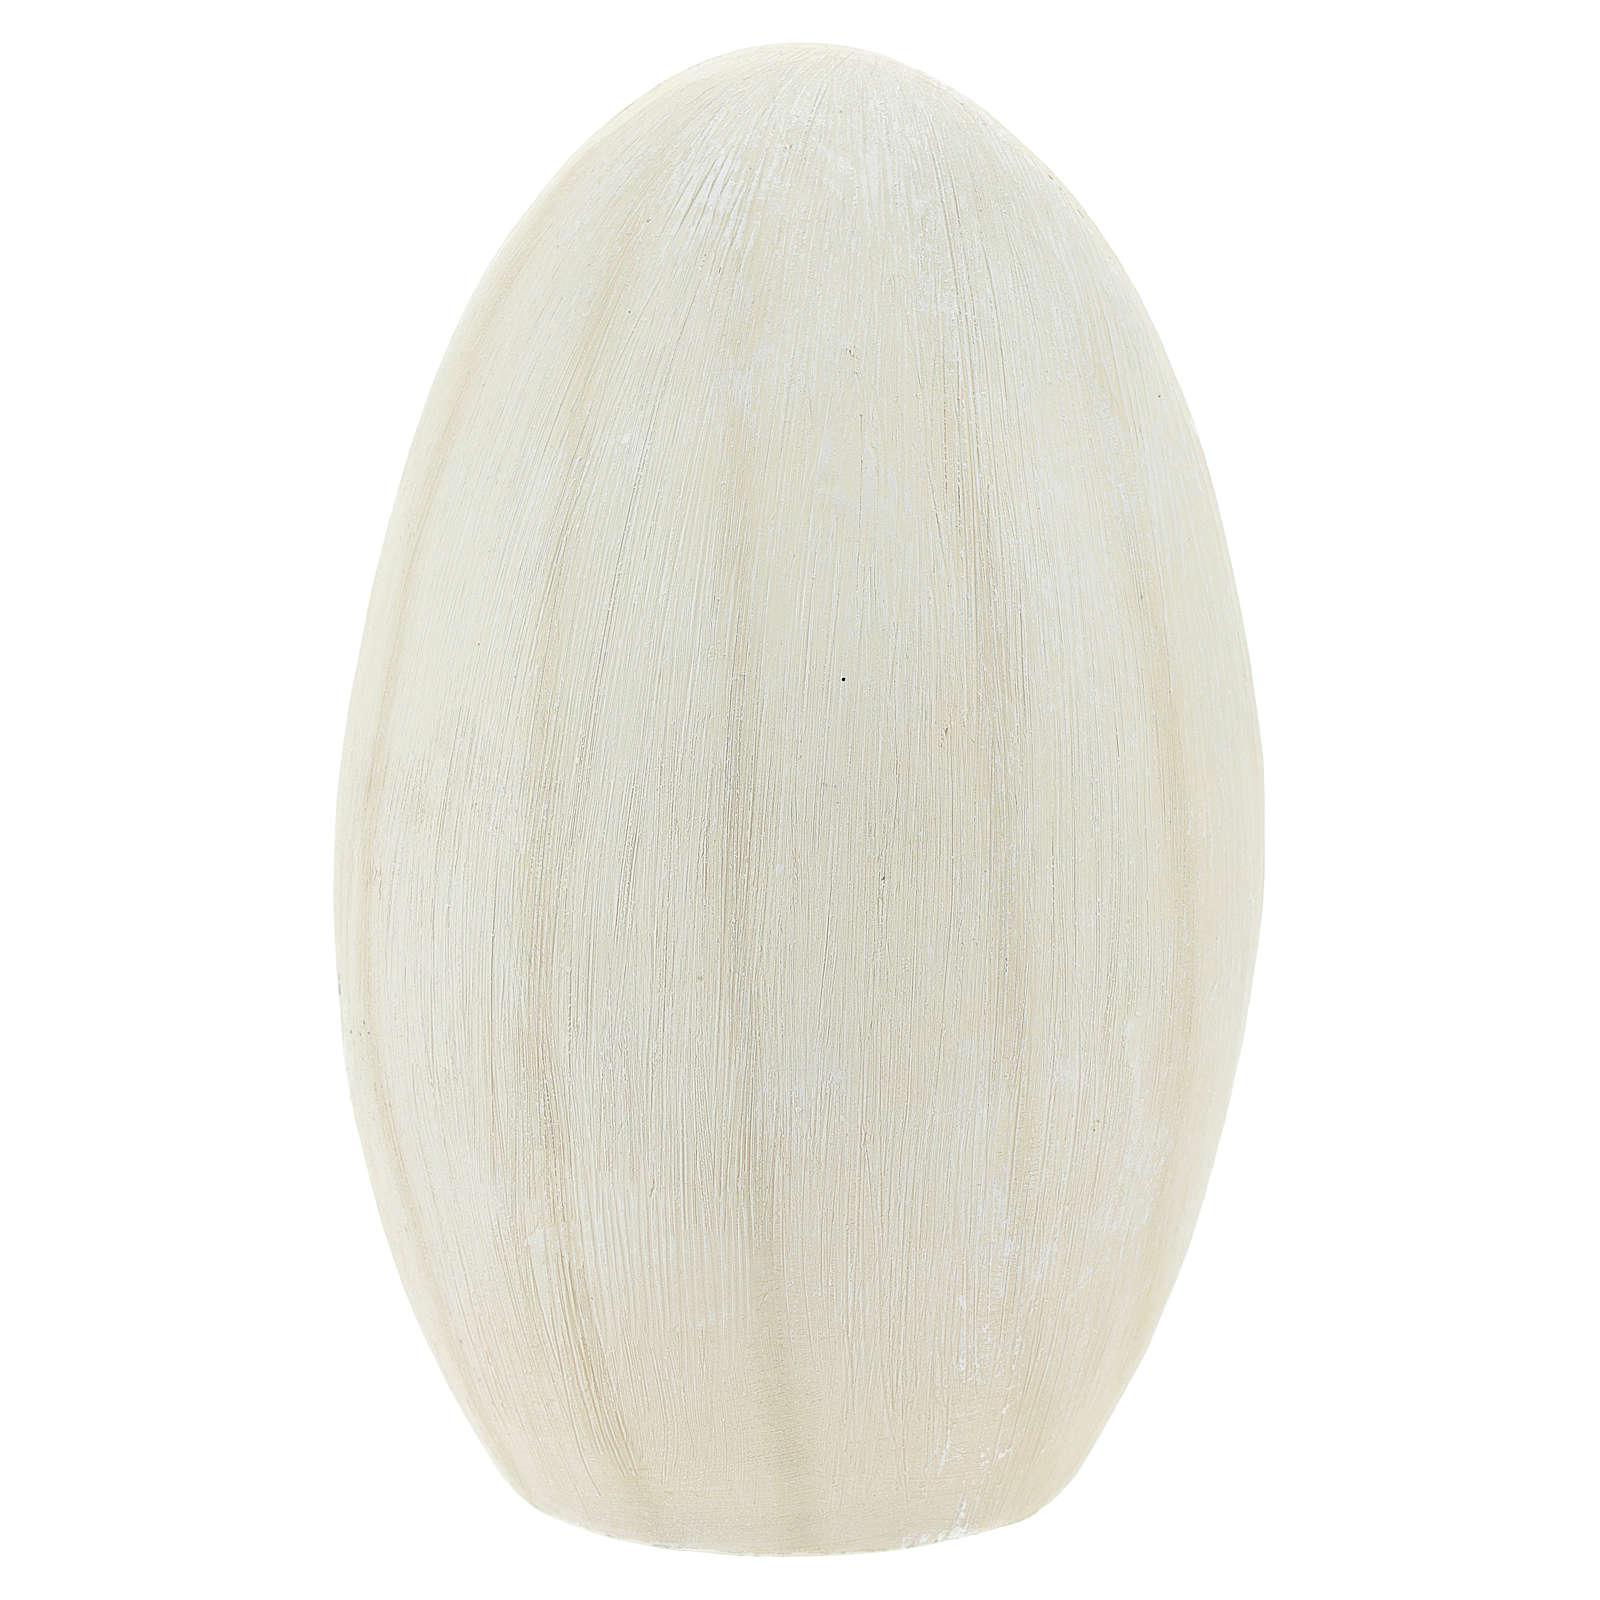 Natività sfondo ovale 17 cm resina 3